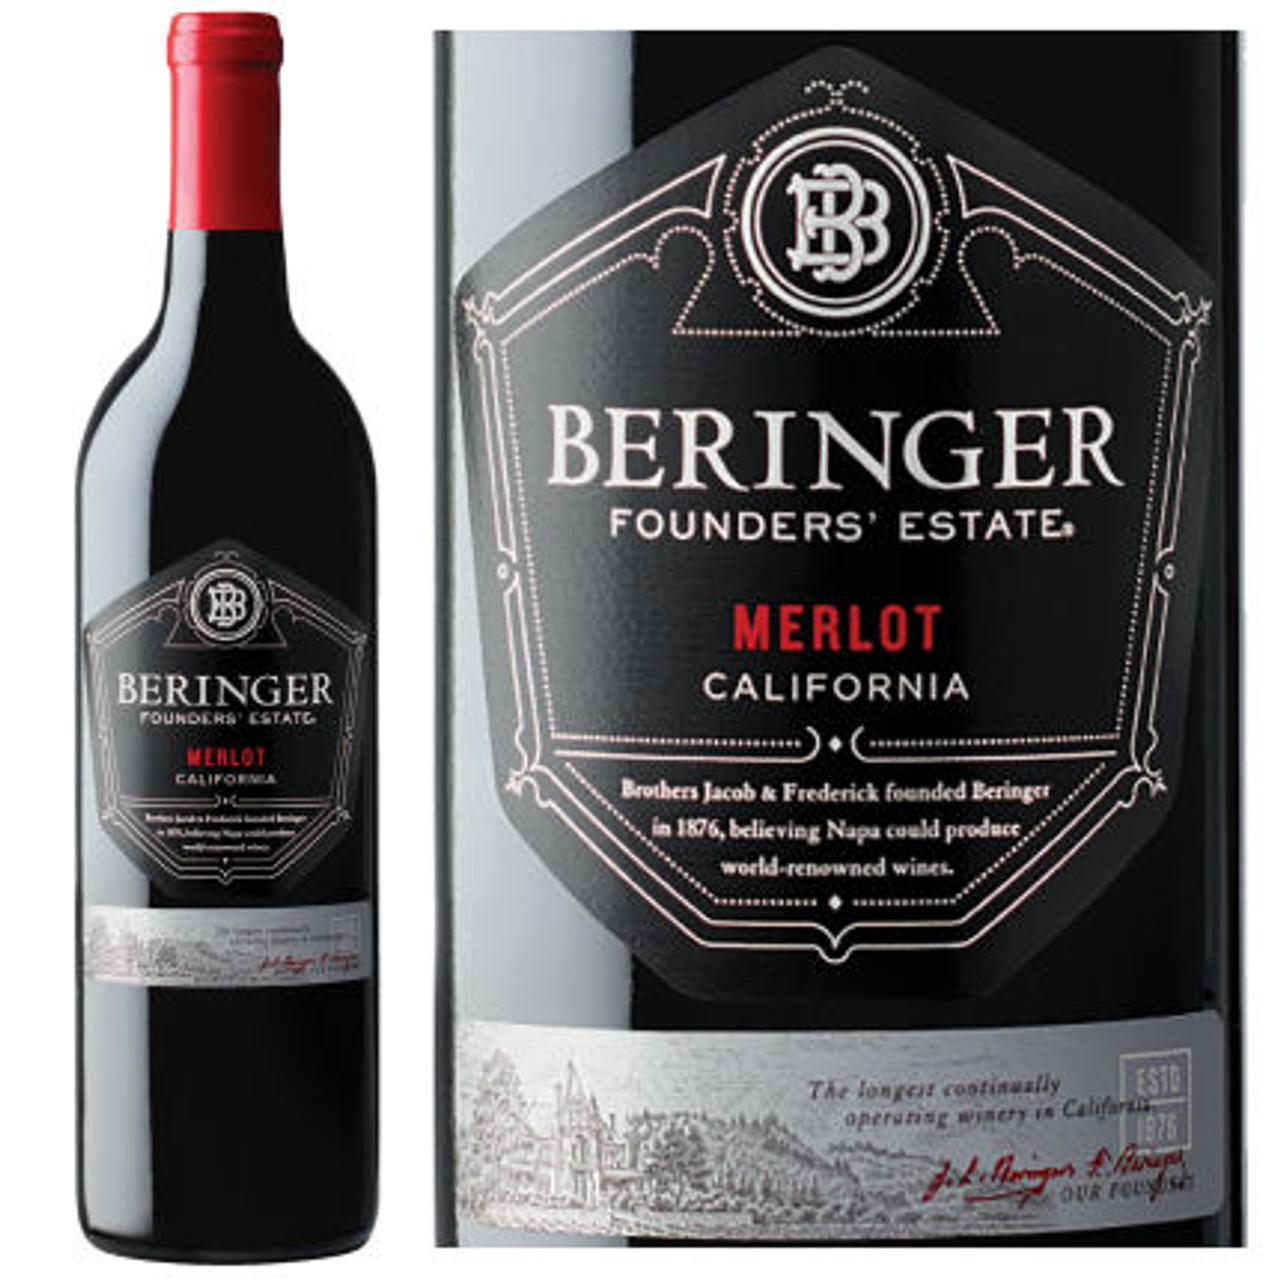 Beringer Founders' Estate California Merlot